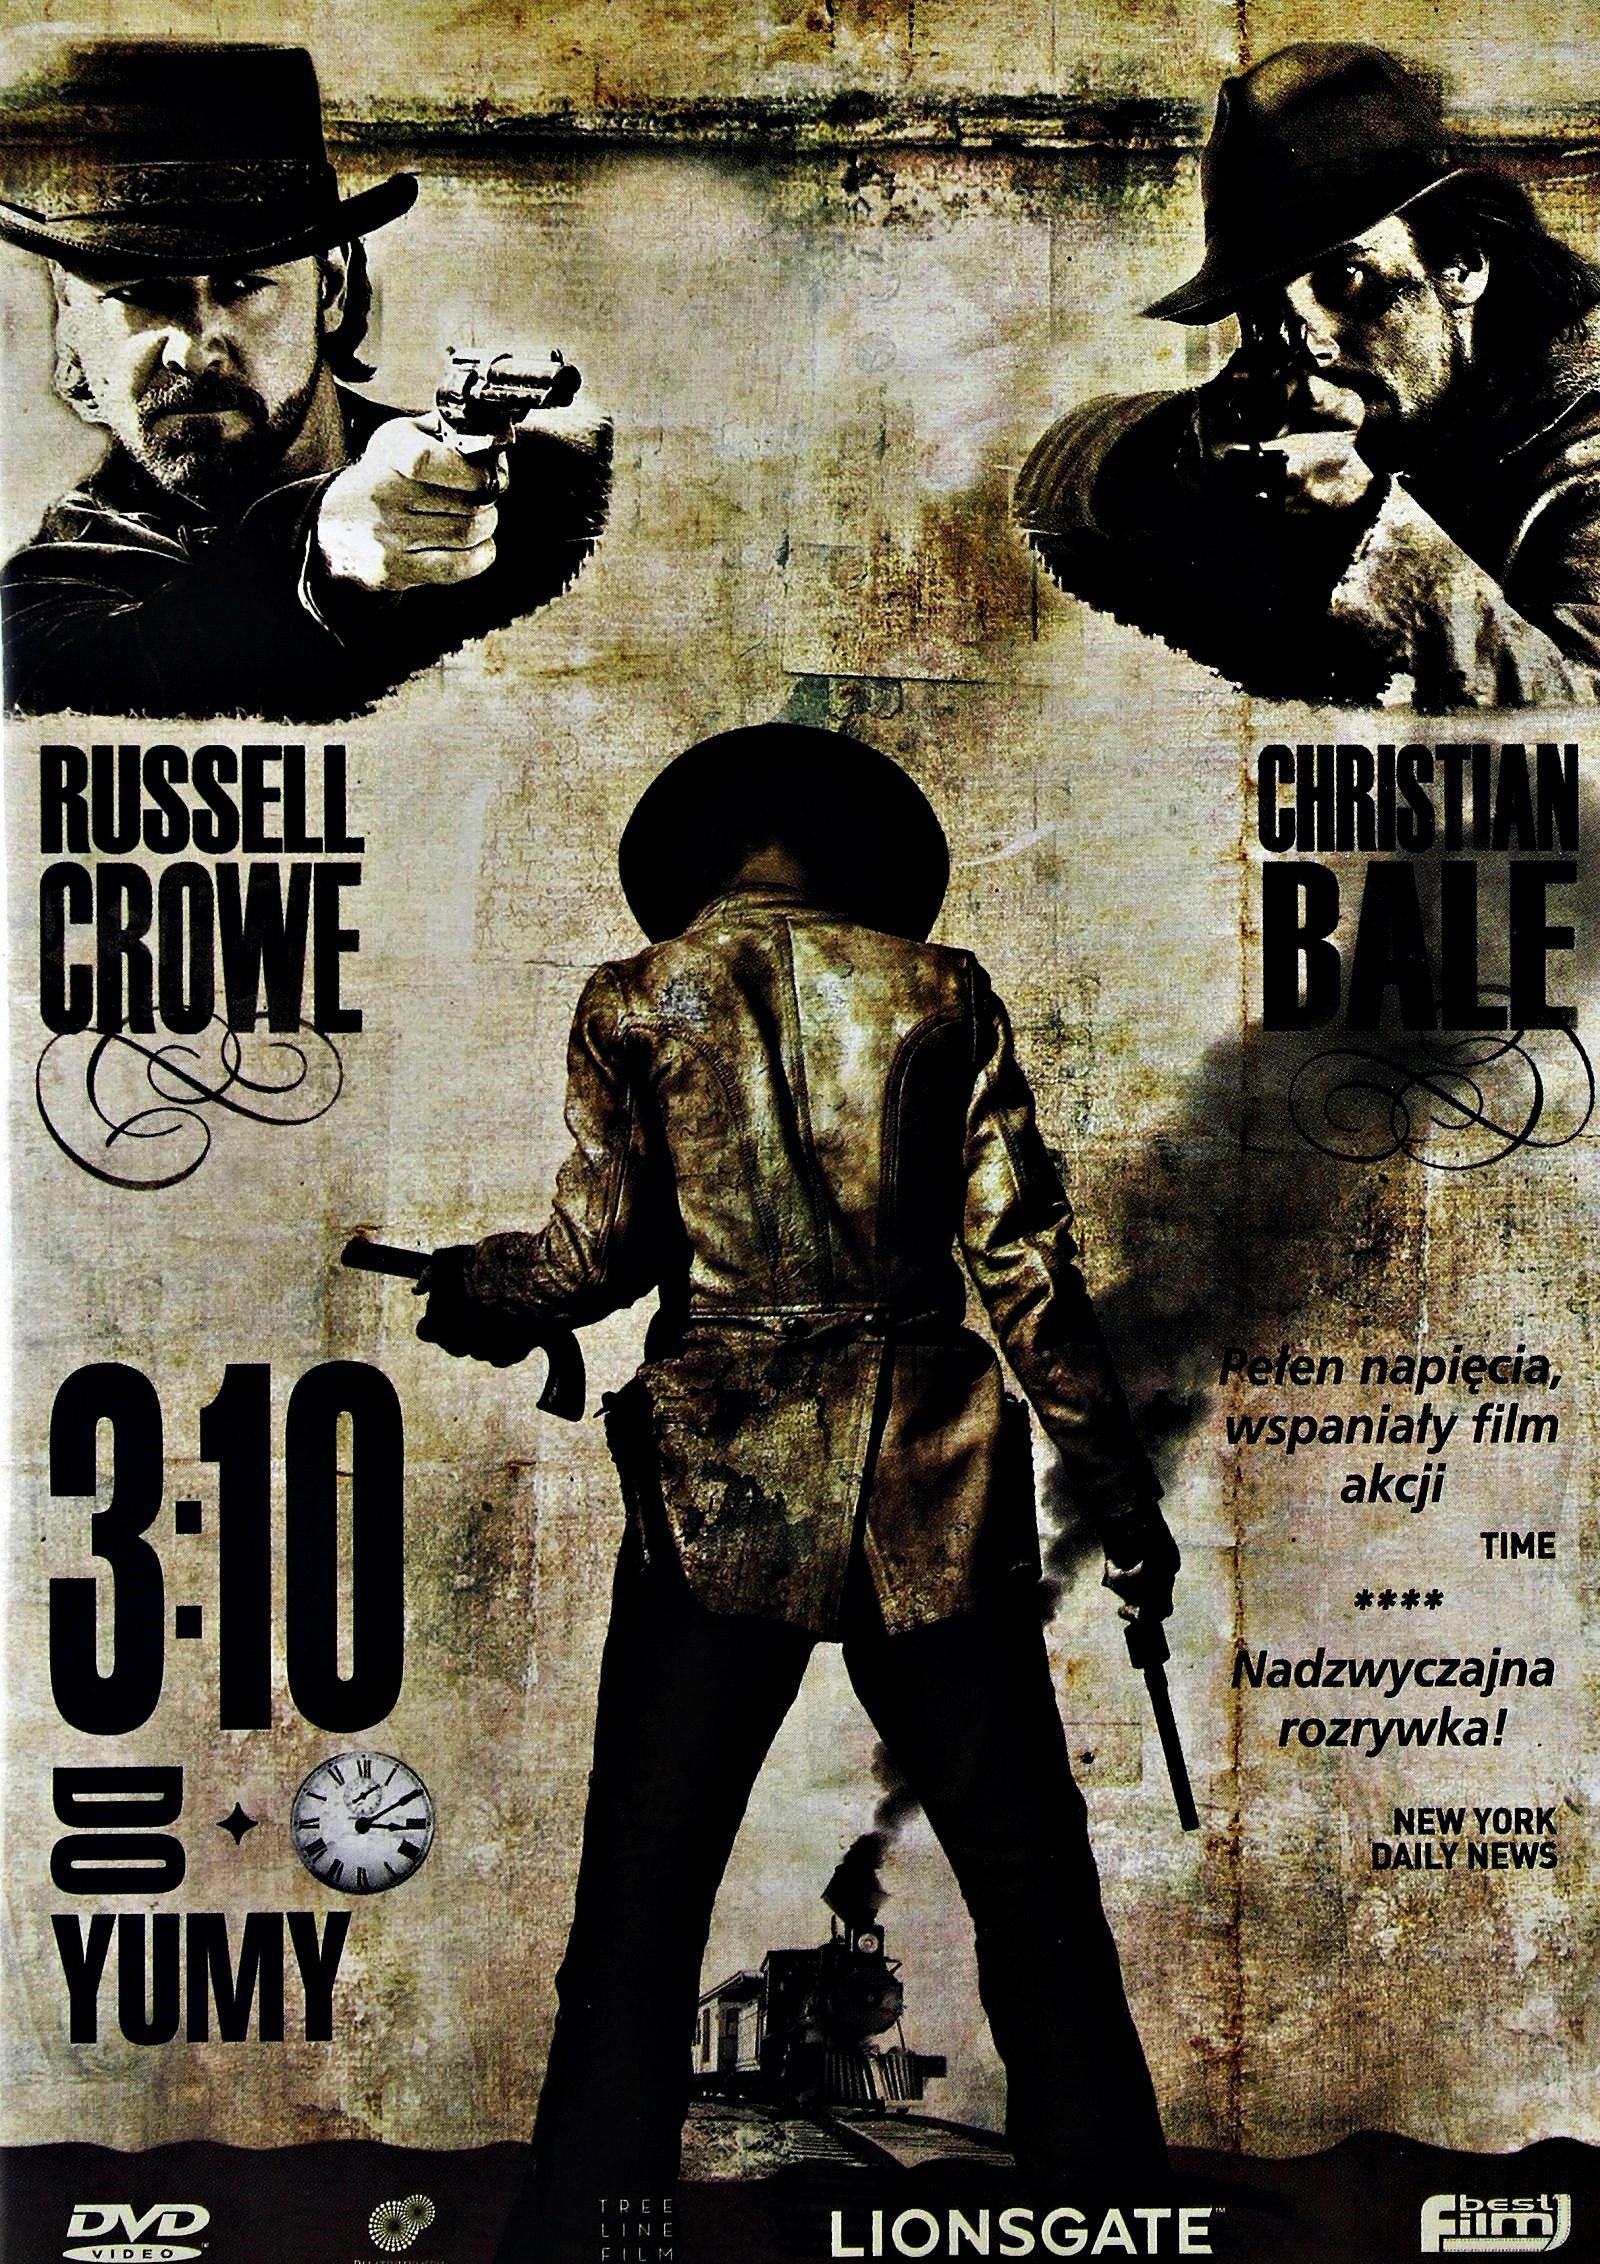 3:10 DO YUMY RUSSELL CROWE FOLIA !